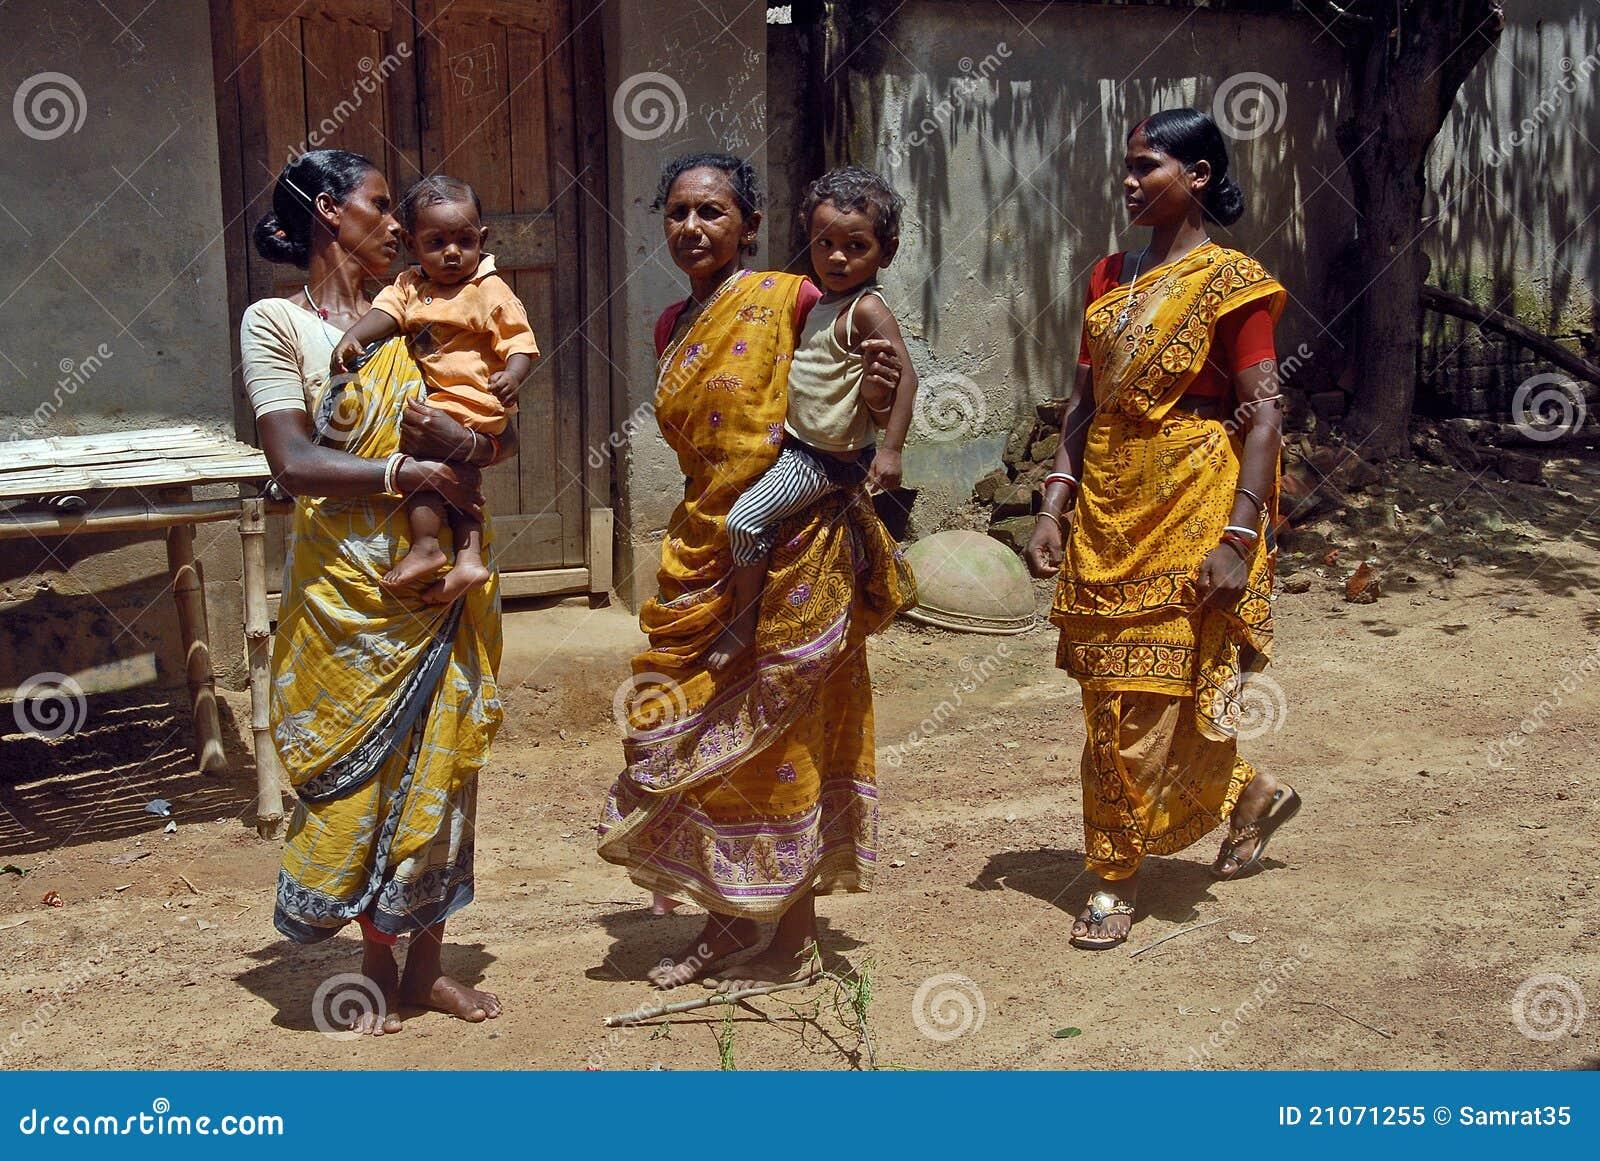 indian village women naked photo